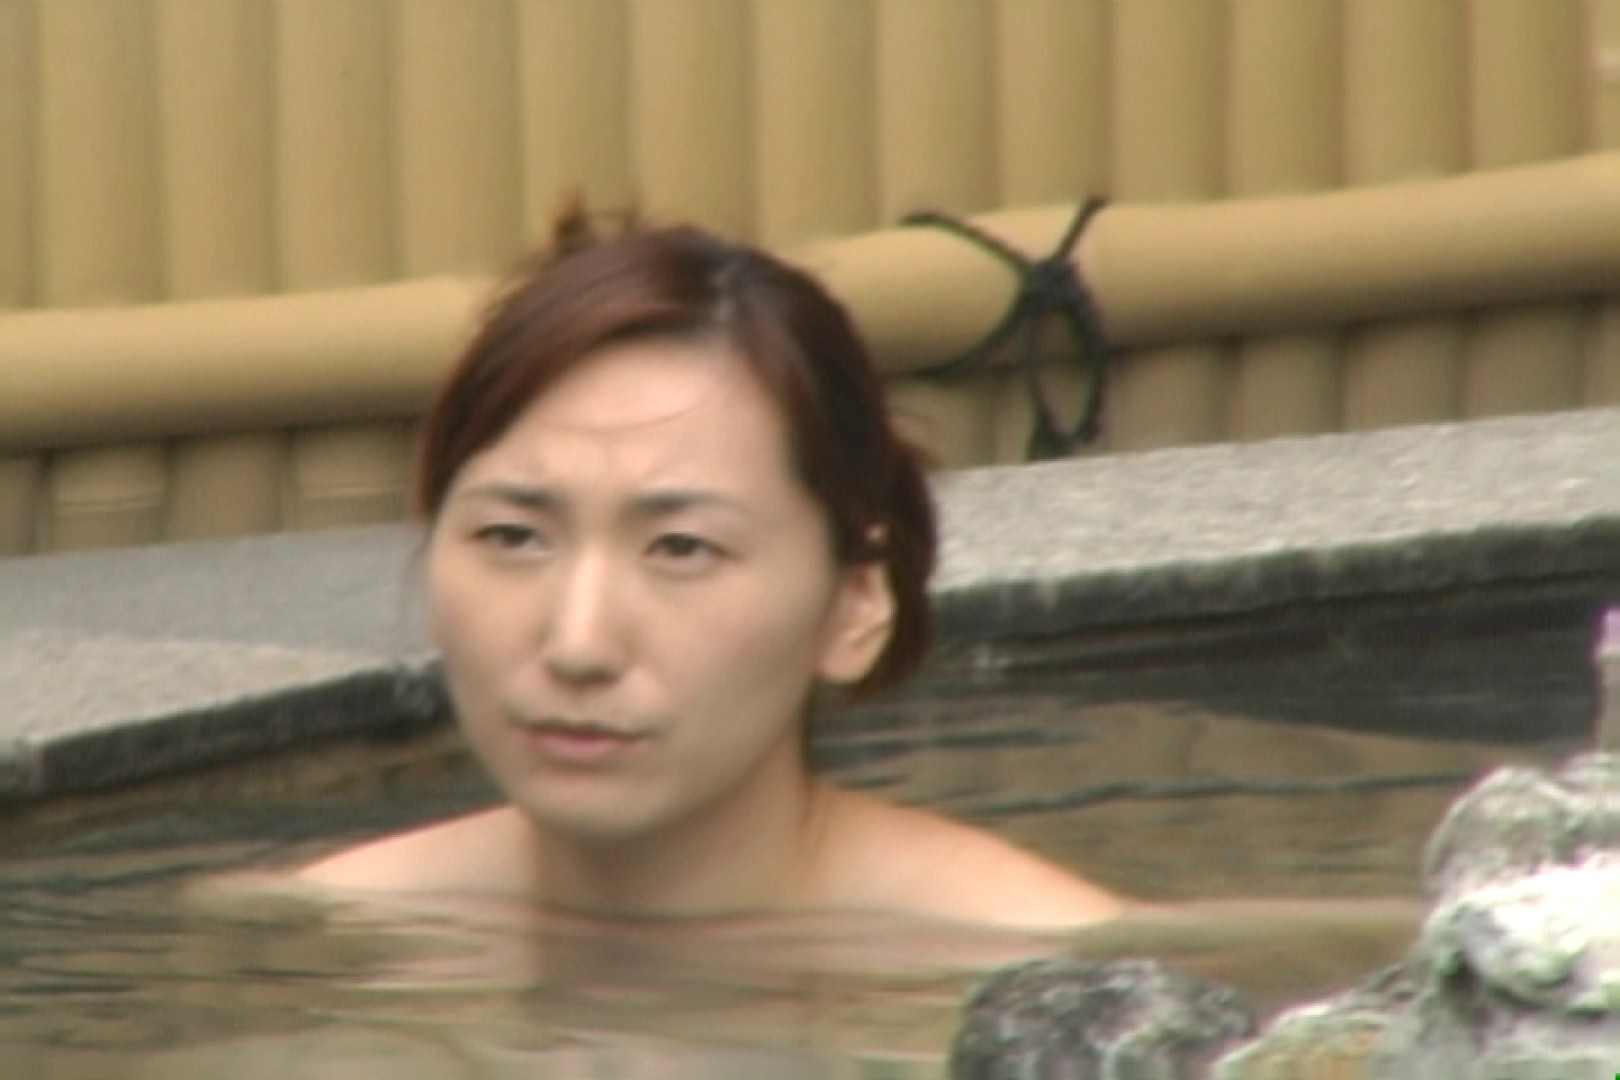 Aquaな露天風呂Vol.616 露天風呂編  89PIX 28